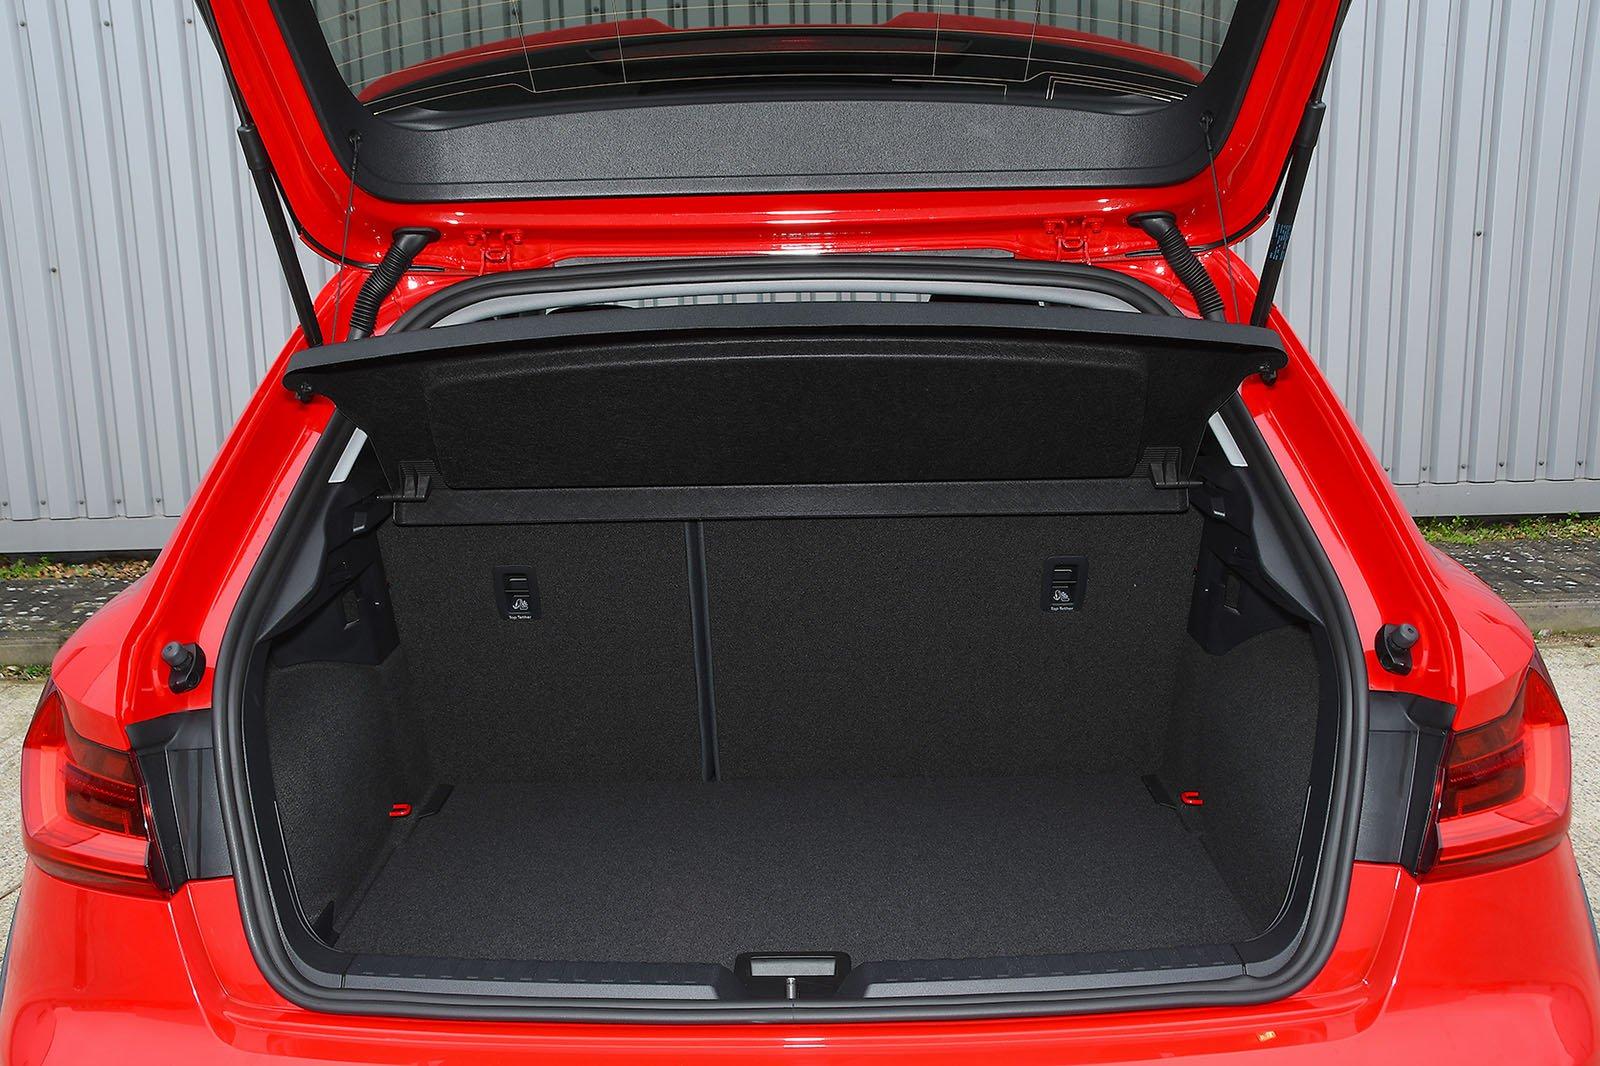 Audi A1 Citycarver boot